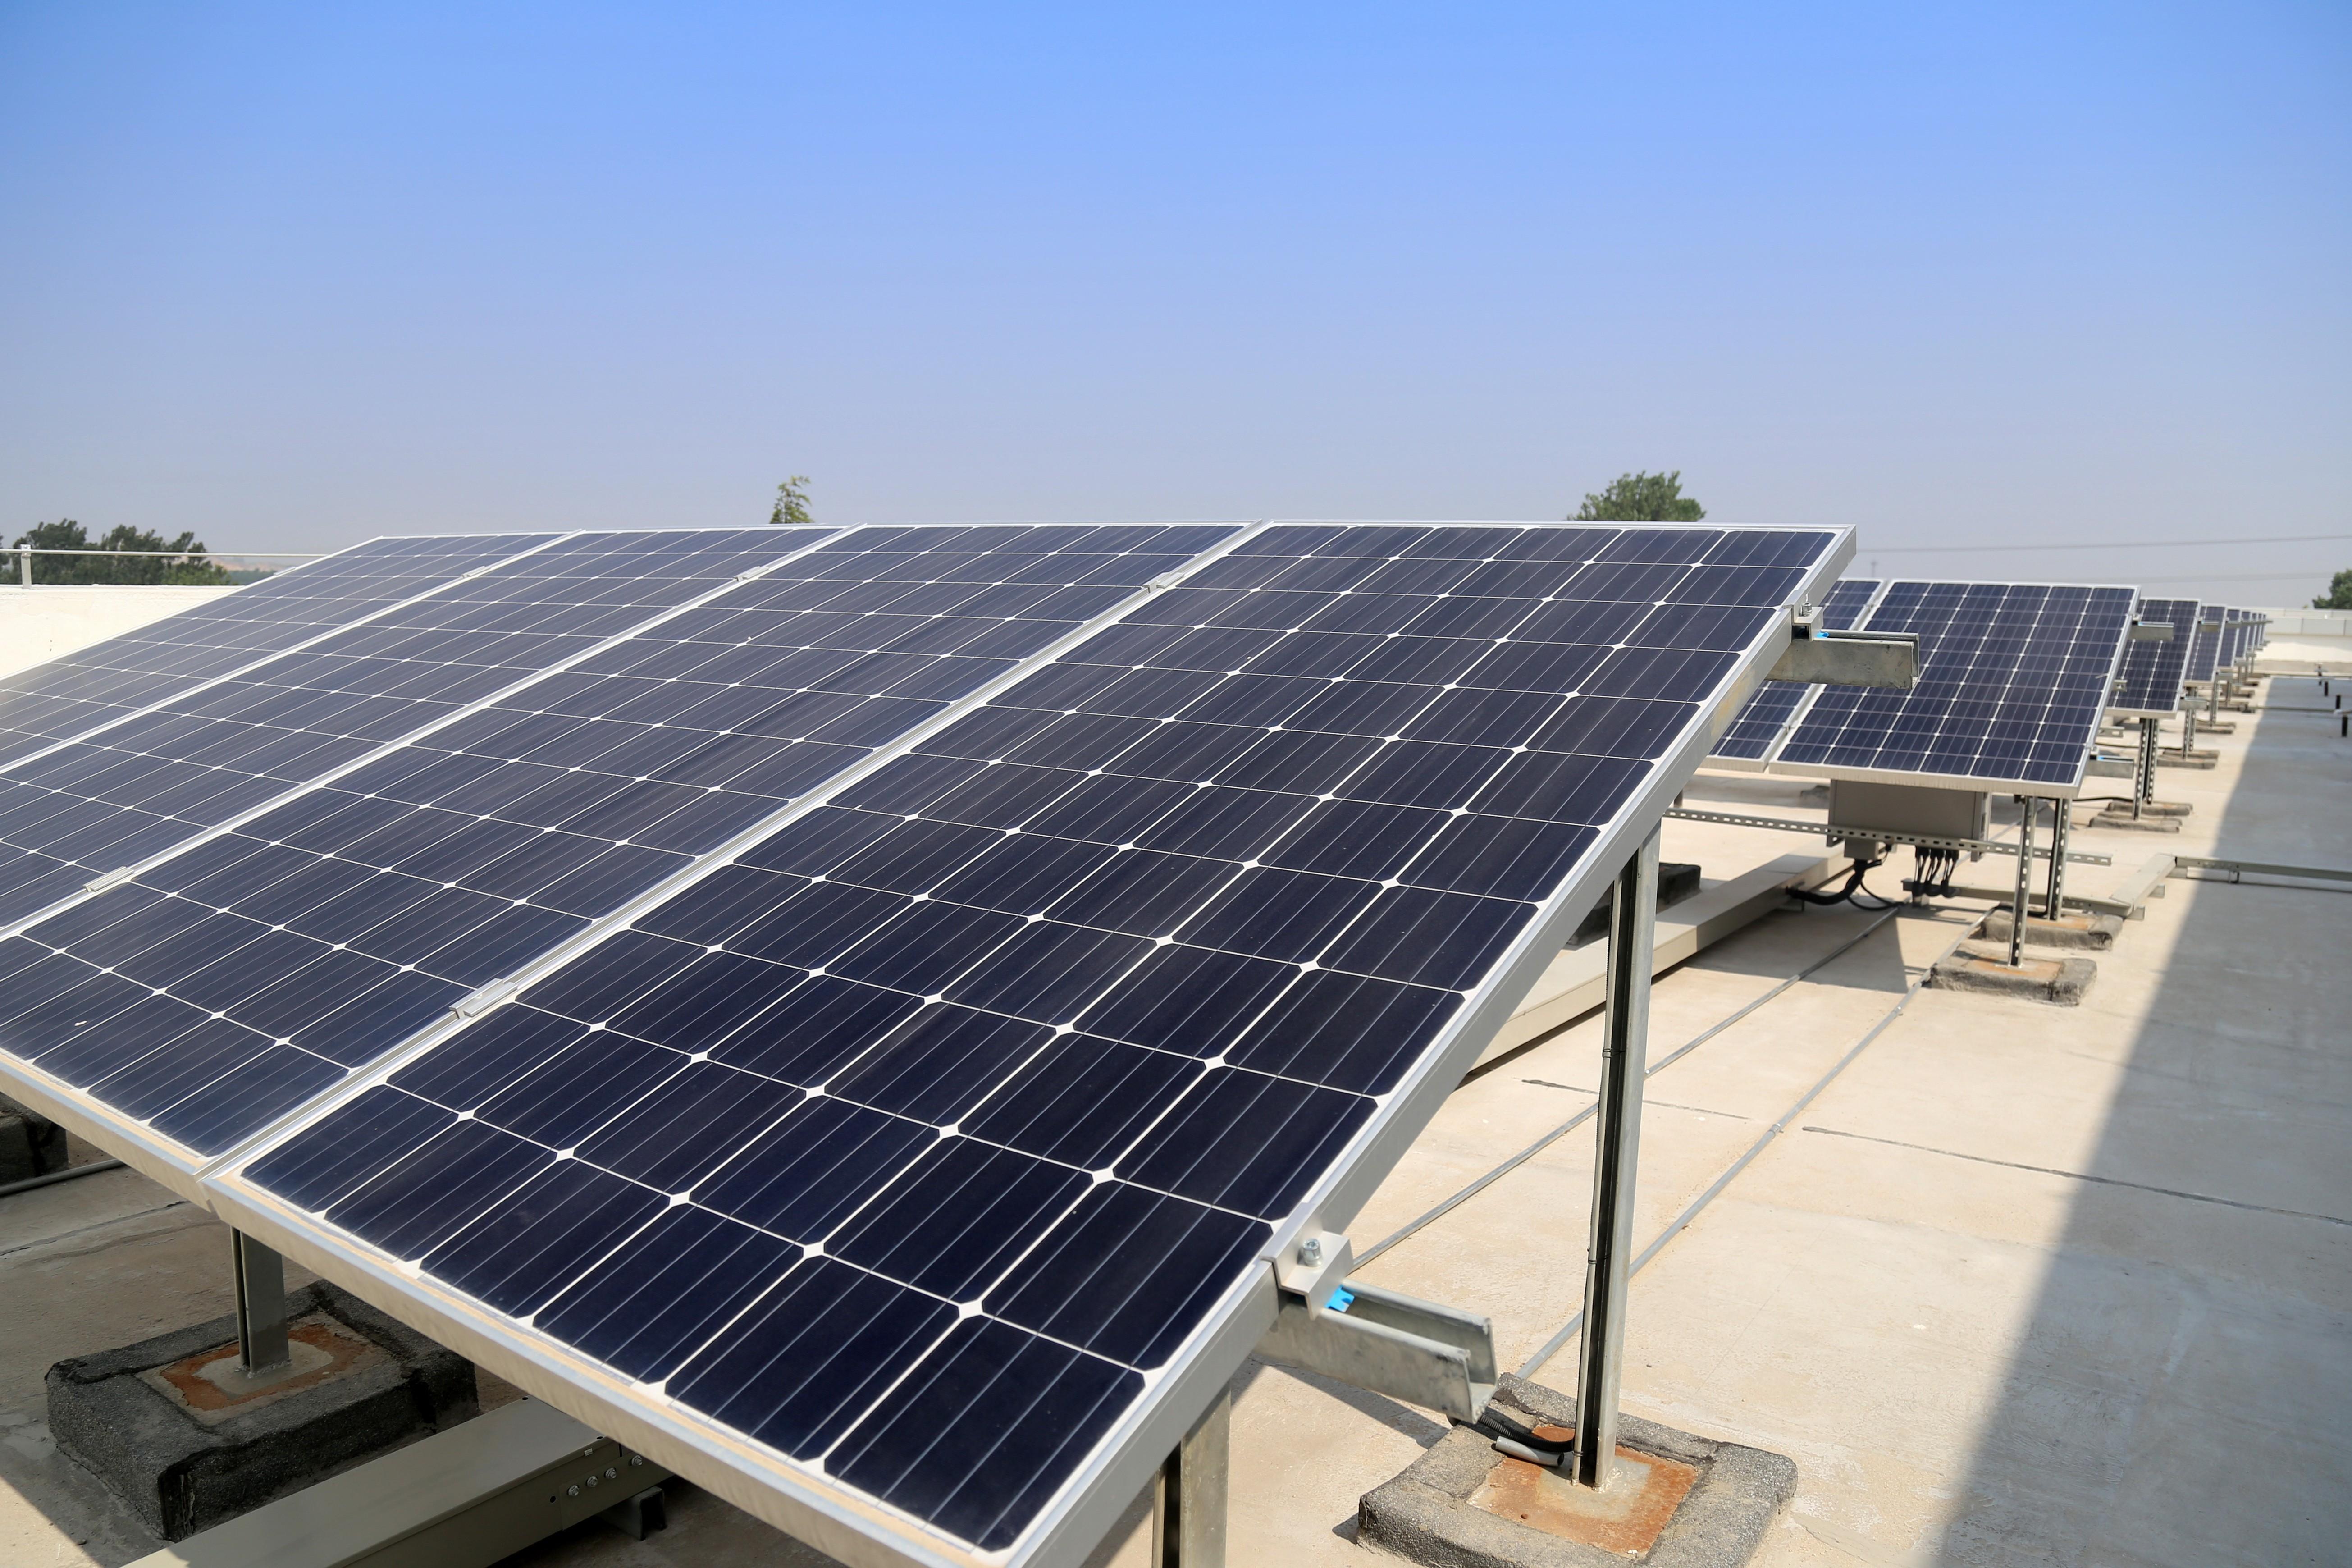 Demanda por energia solar cresce no Brasil